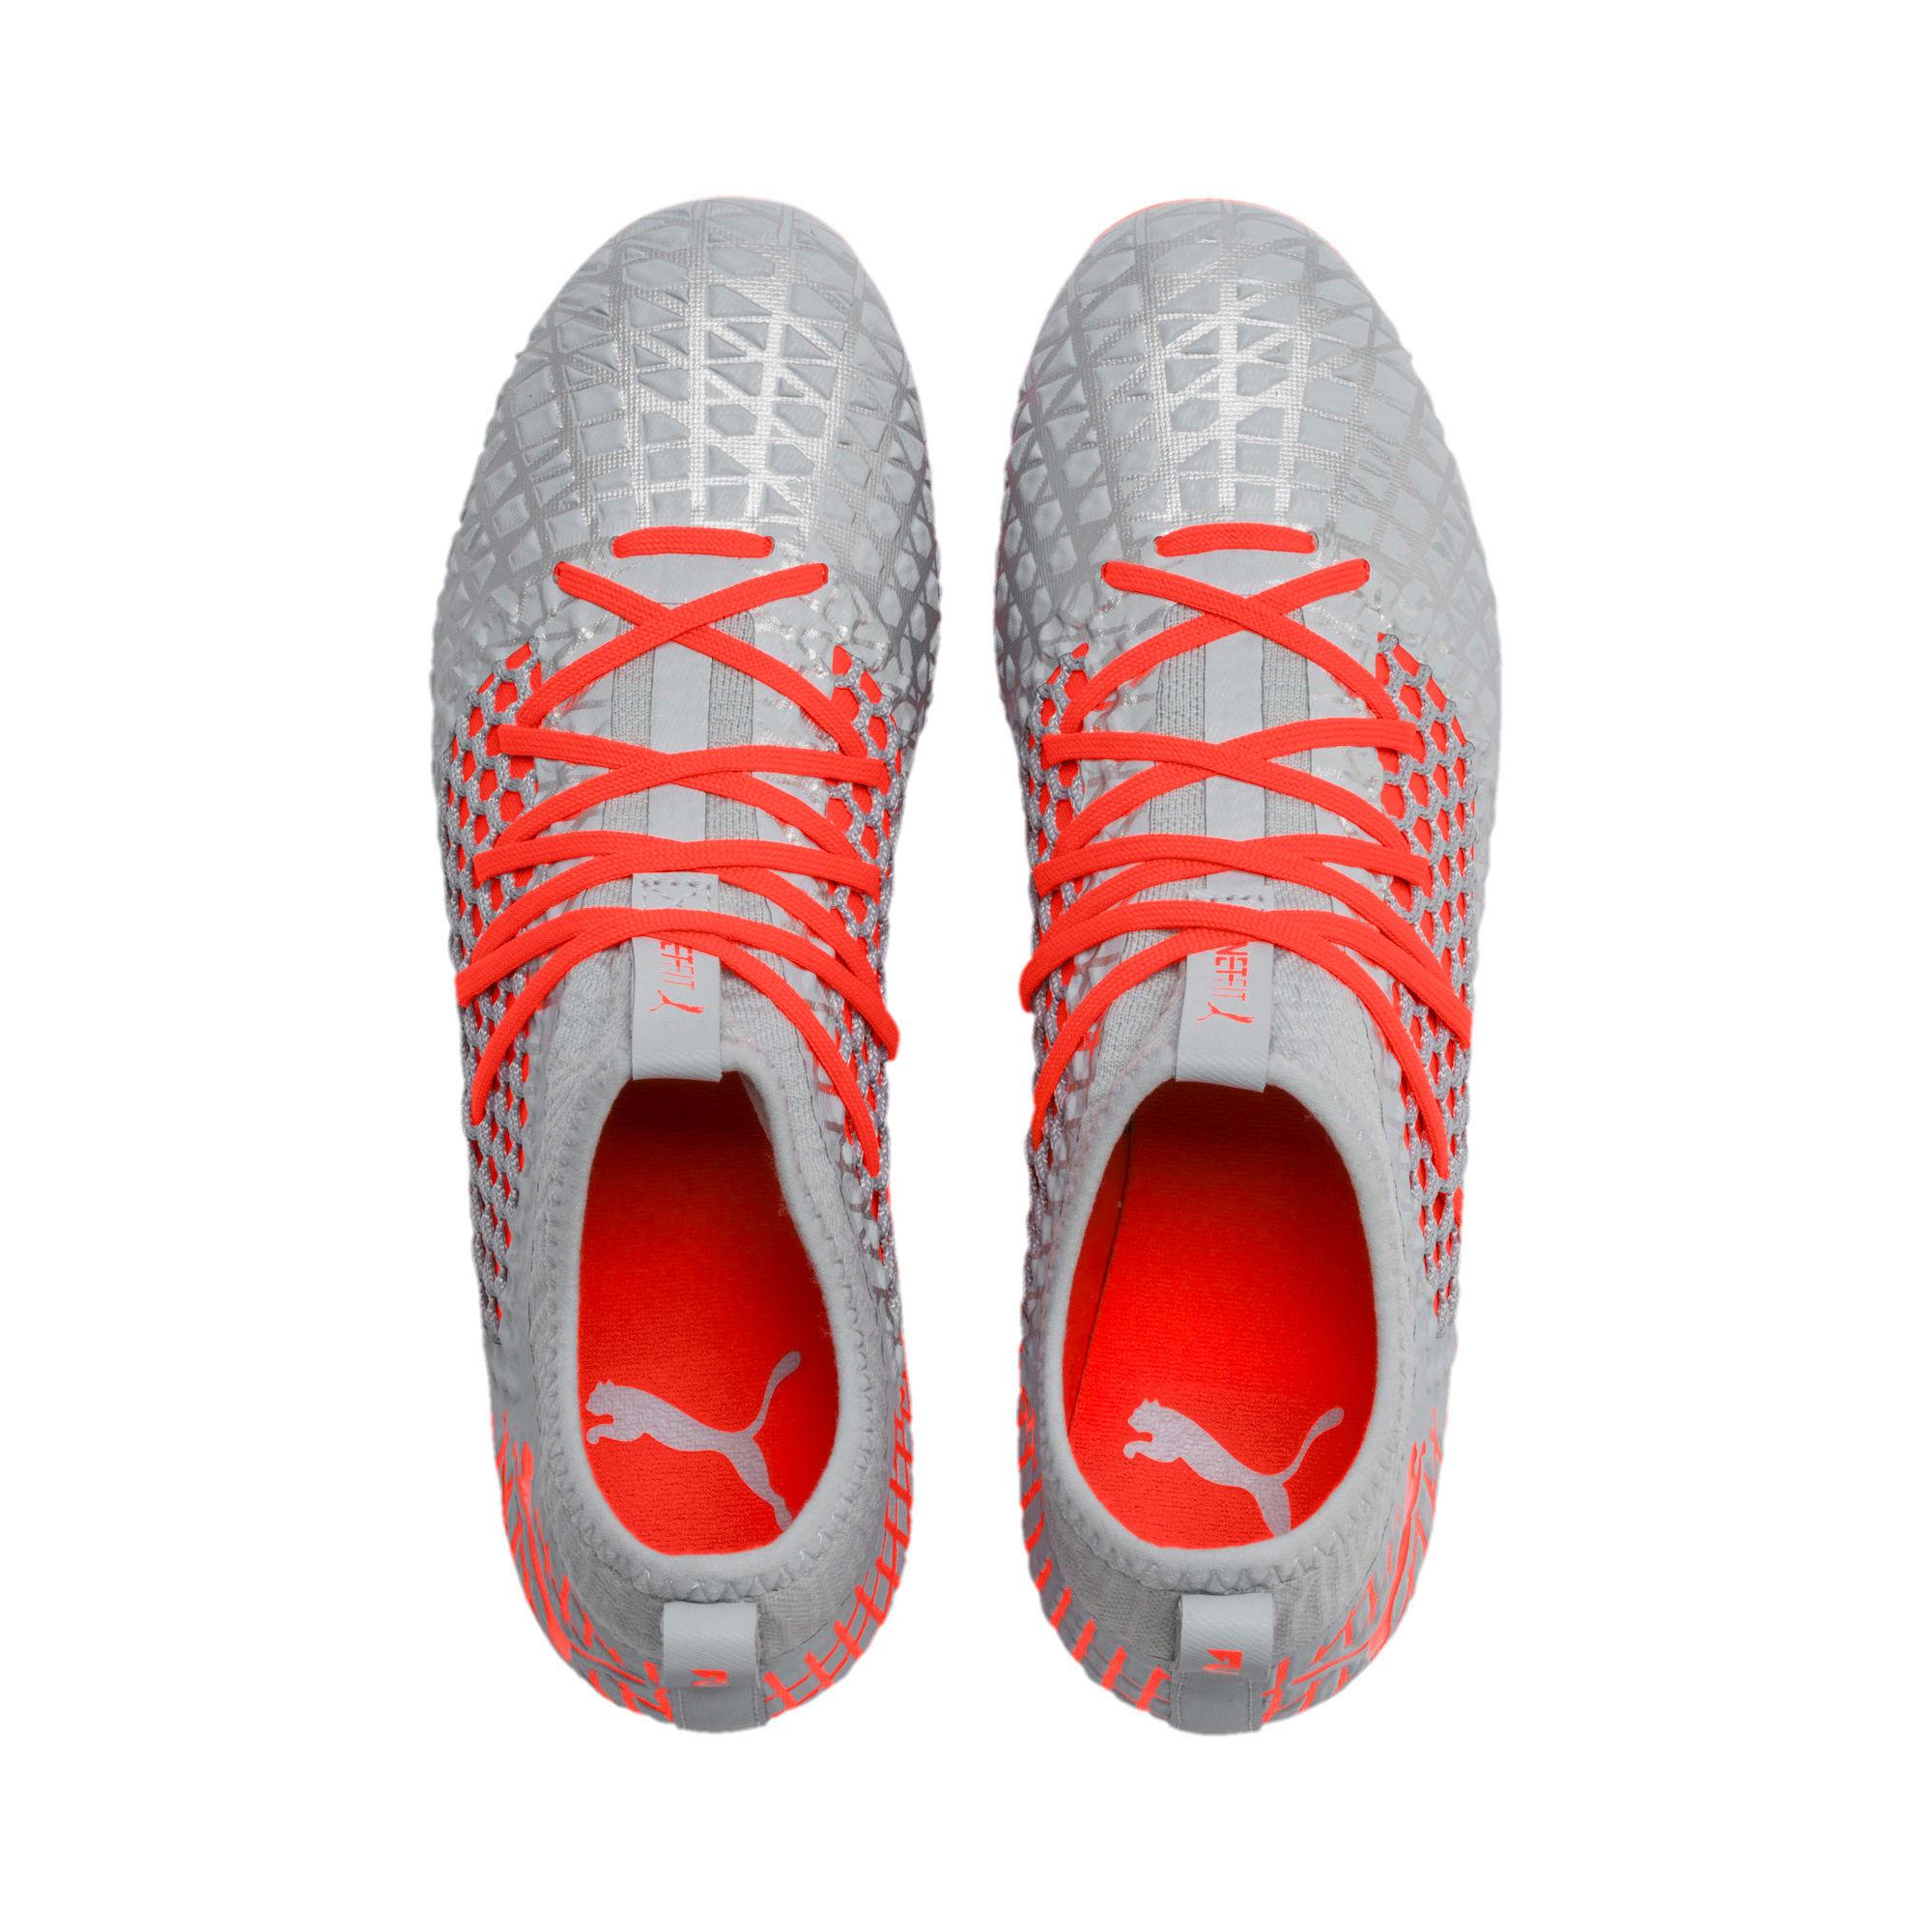 Anteprima 7 di FUTURE 4.3 NETFIT FG/AG Men's Football Boots, Glacial Blue-Nrgy Red, medio